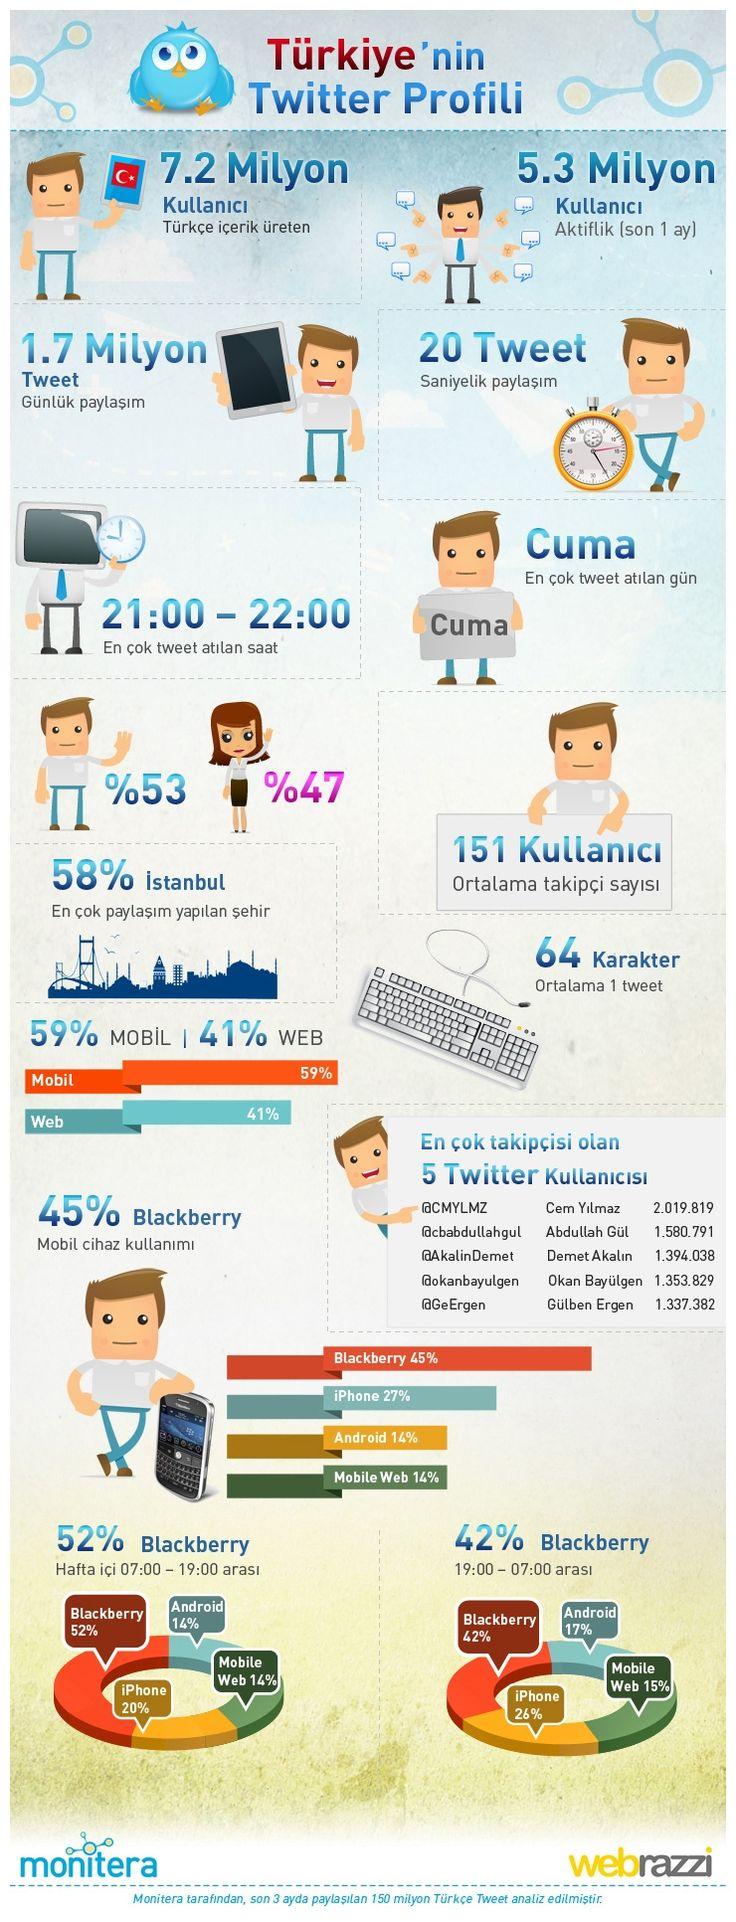 Turkey Twitter Usage Statistics